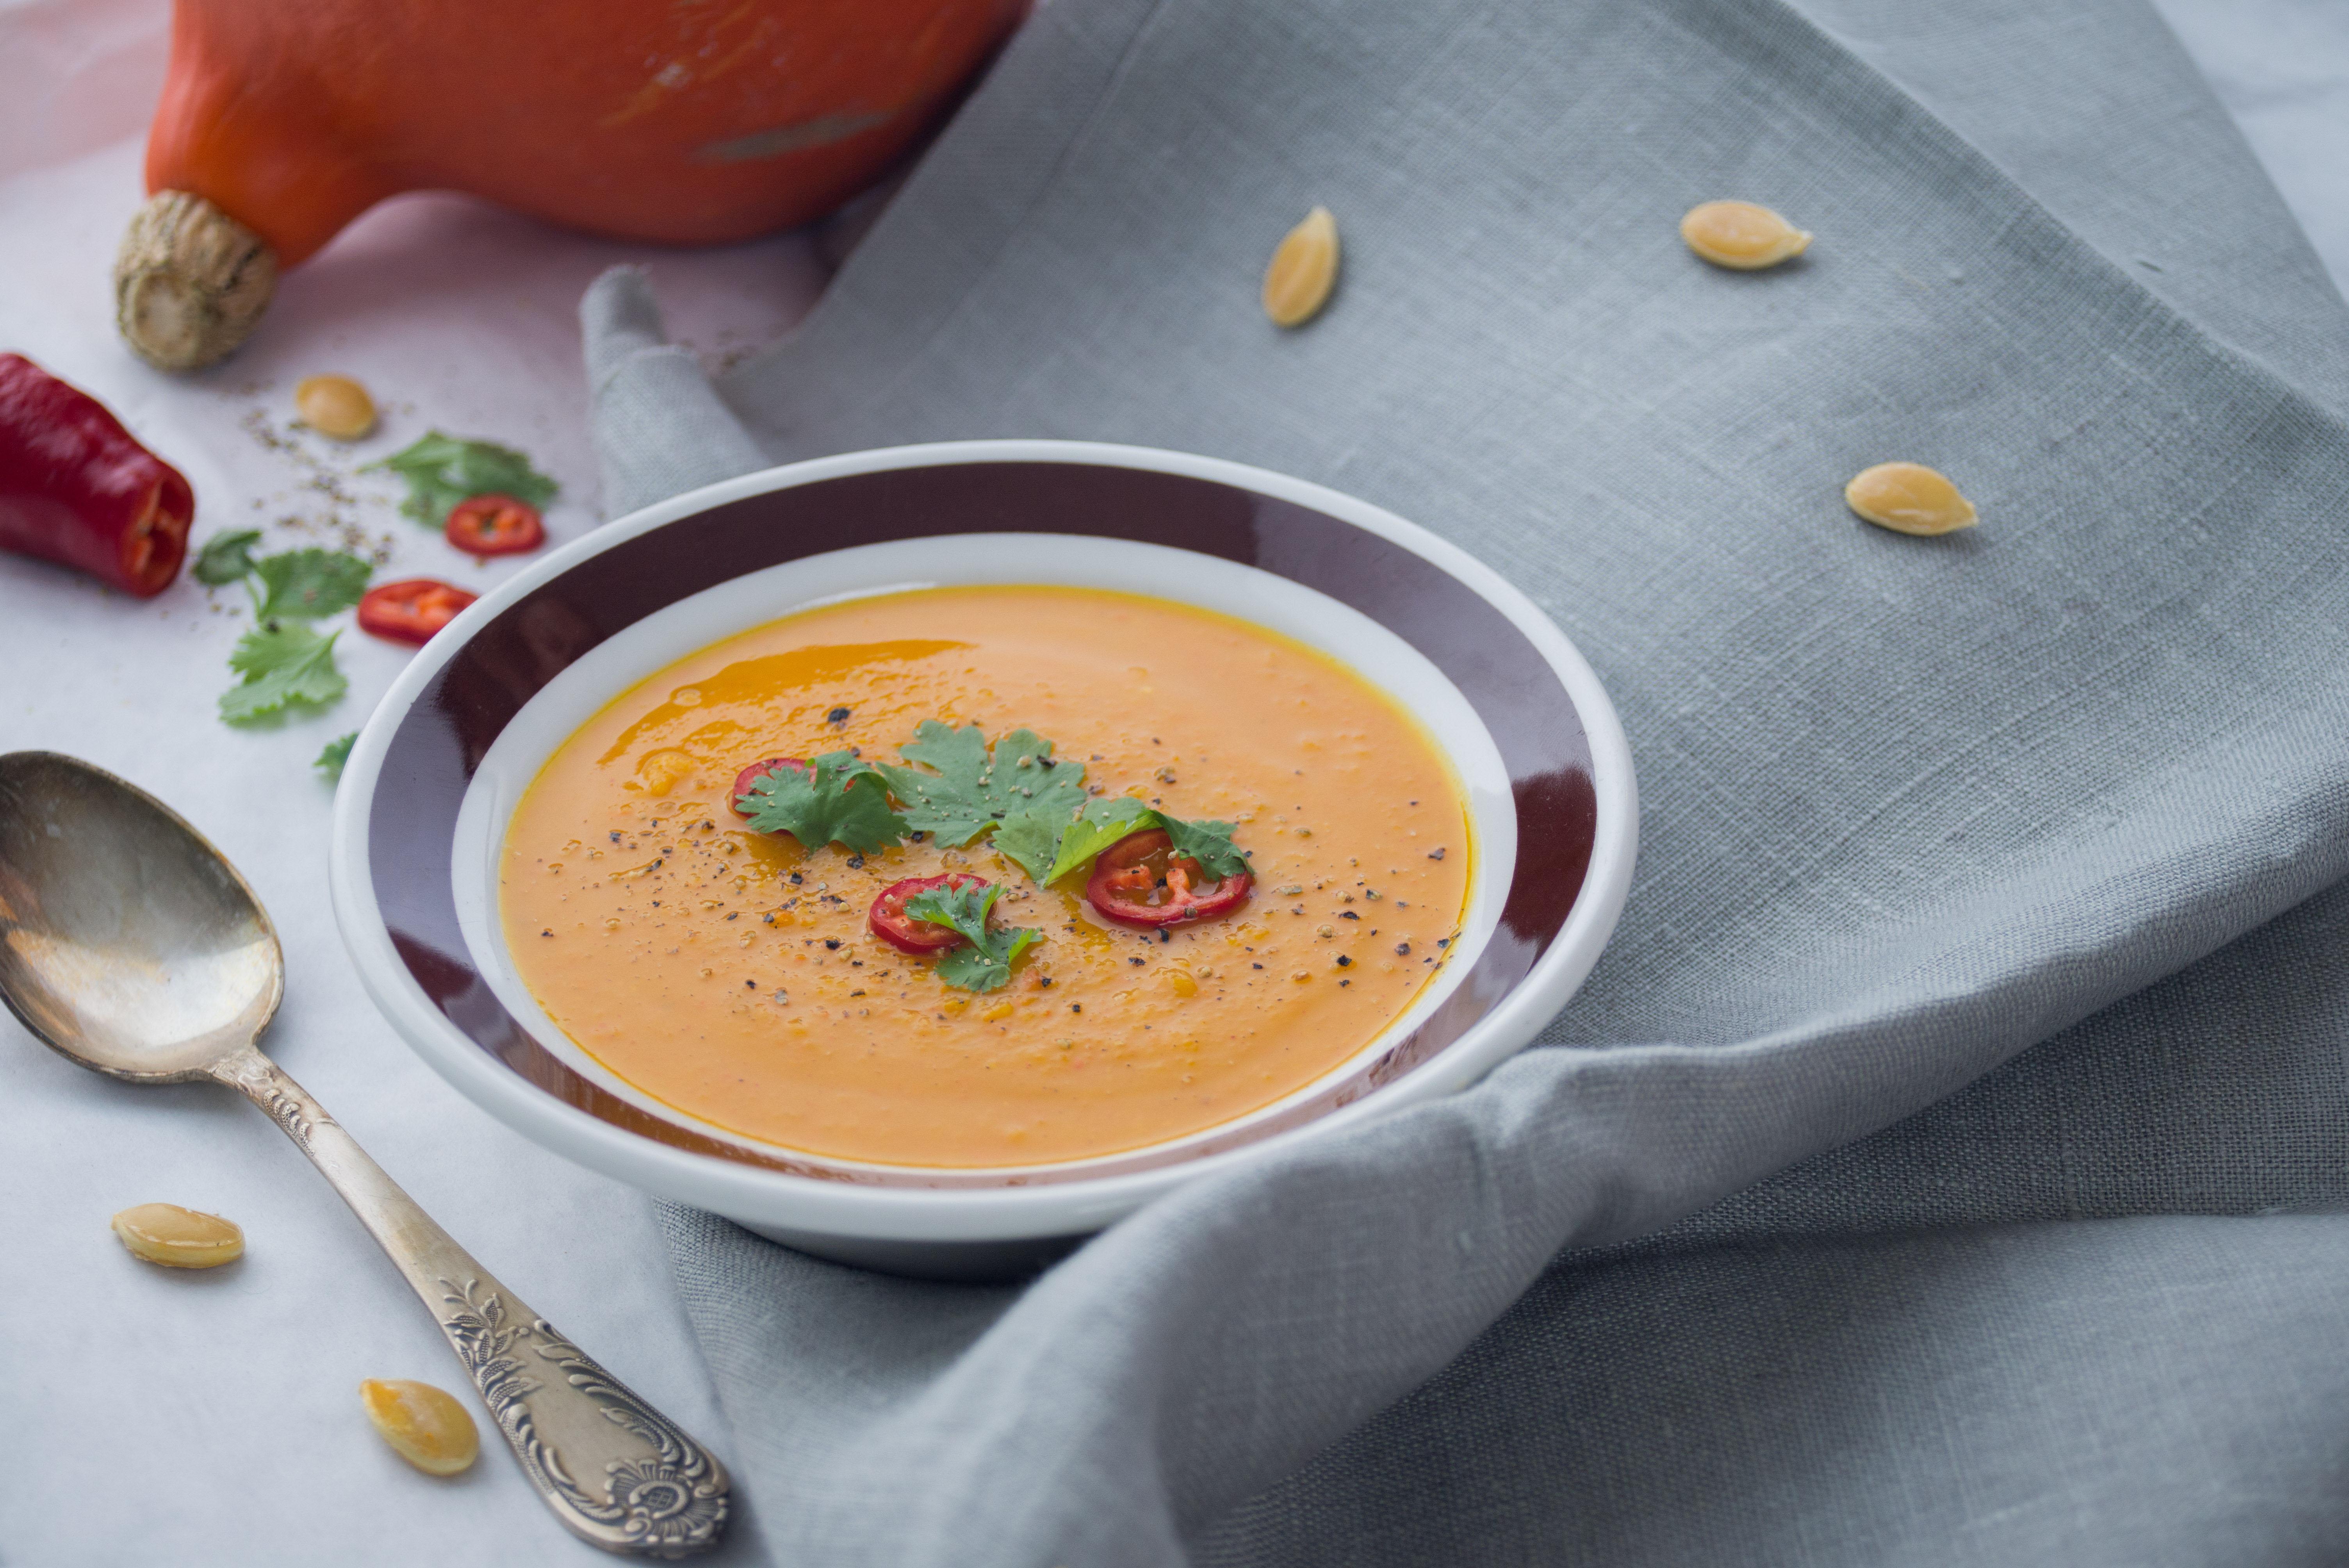 zupa dyniowa na blogu - lookingforcooking.pl